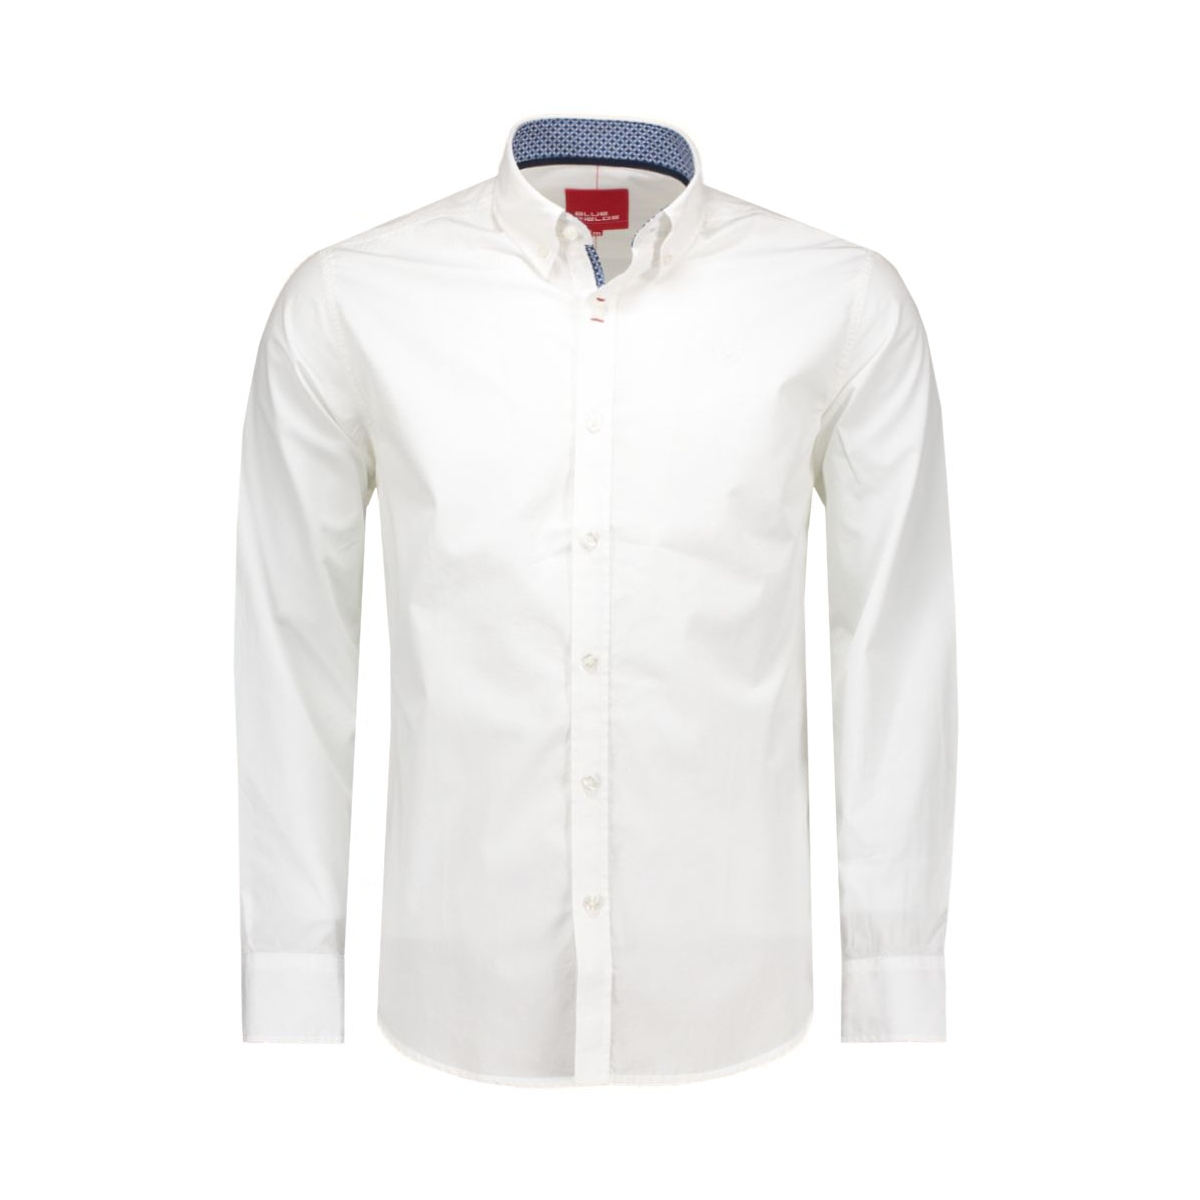 211-35018 bluefields overhemd 1100